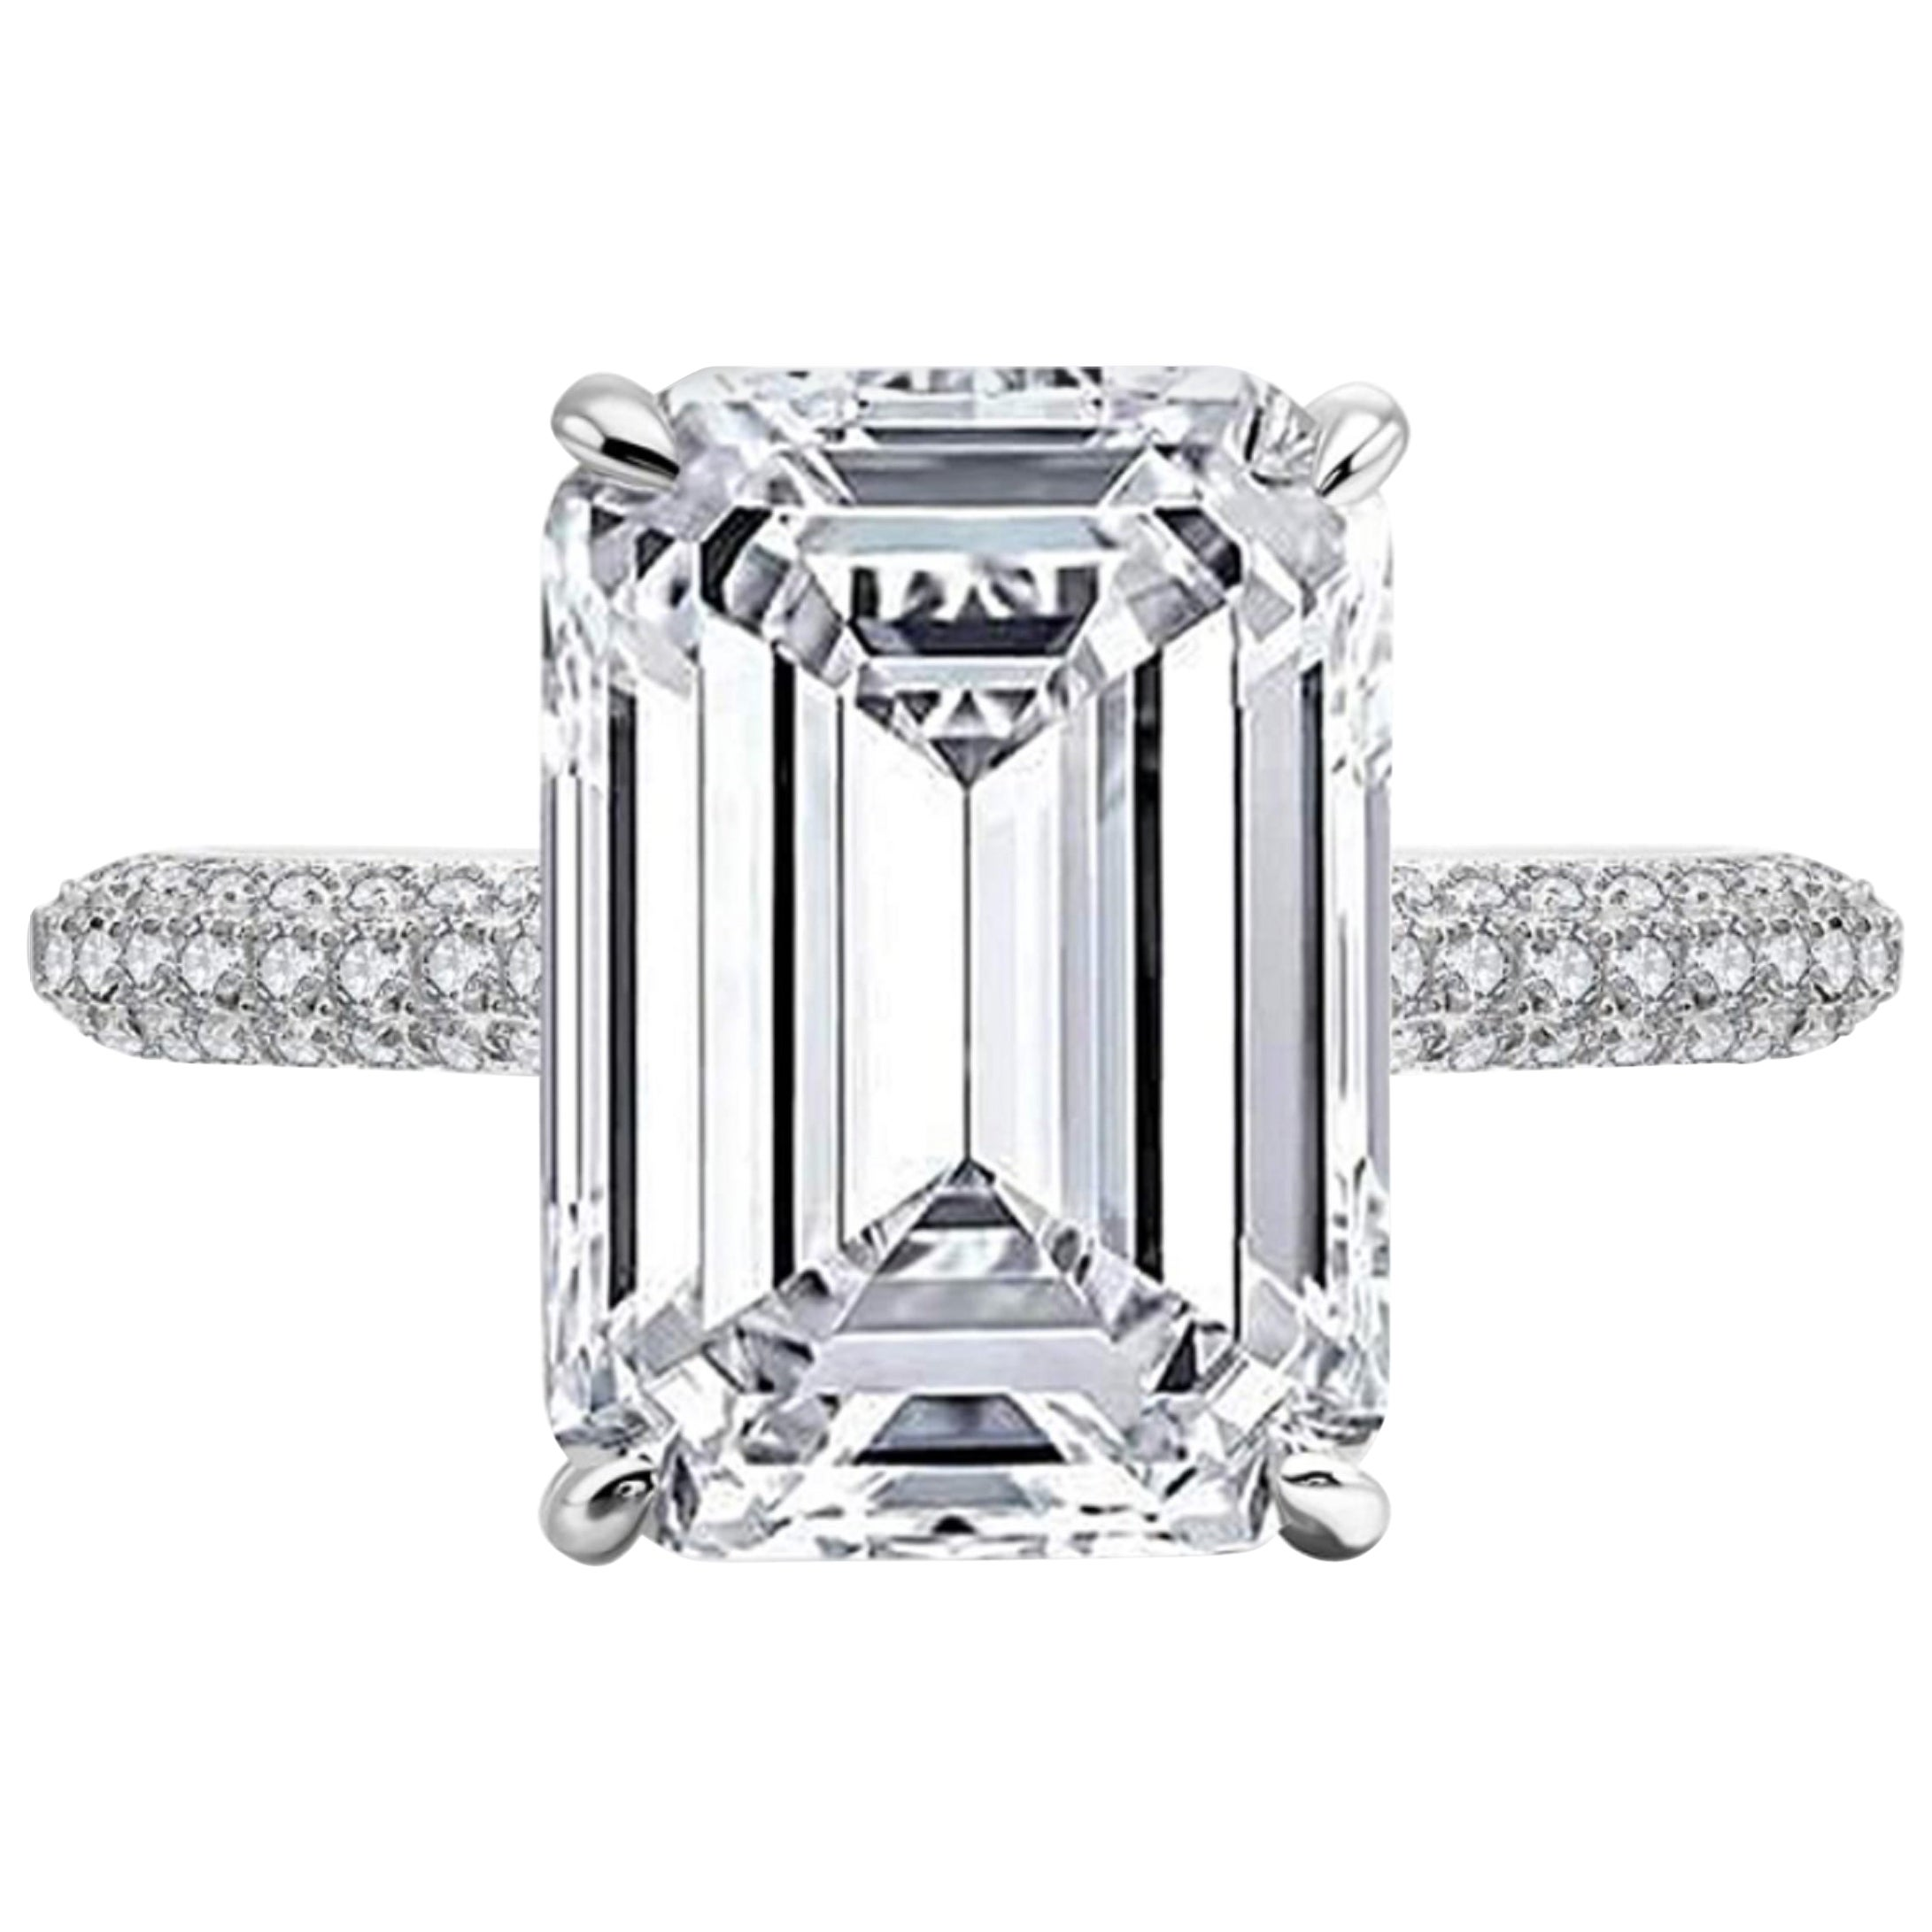 GIA Certified 3 Carat Emerald Cut Diamond Ring